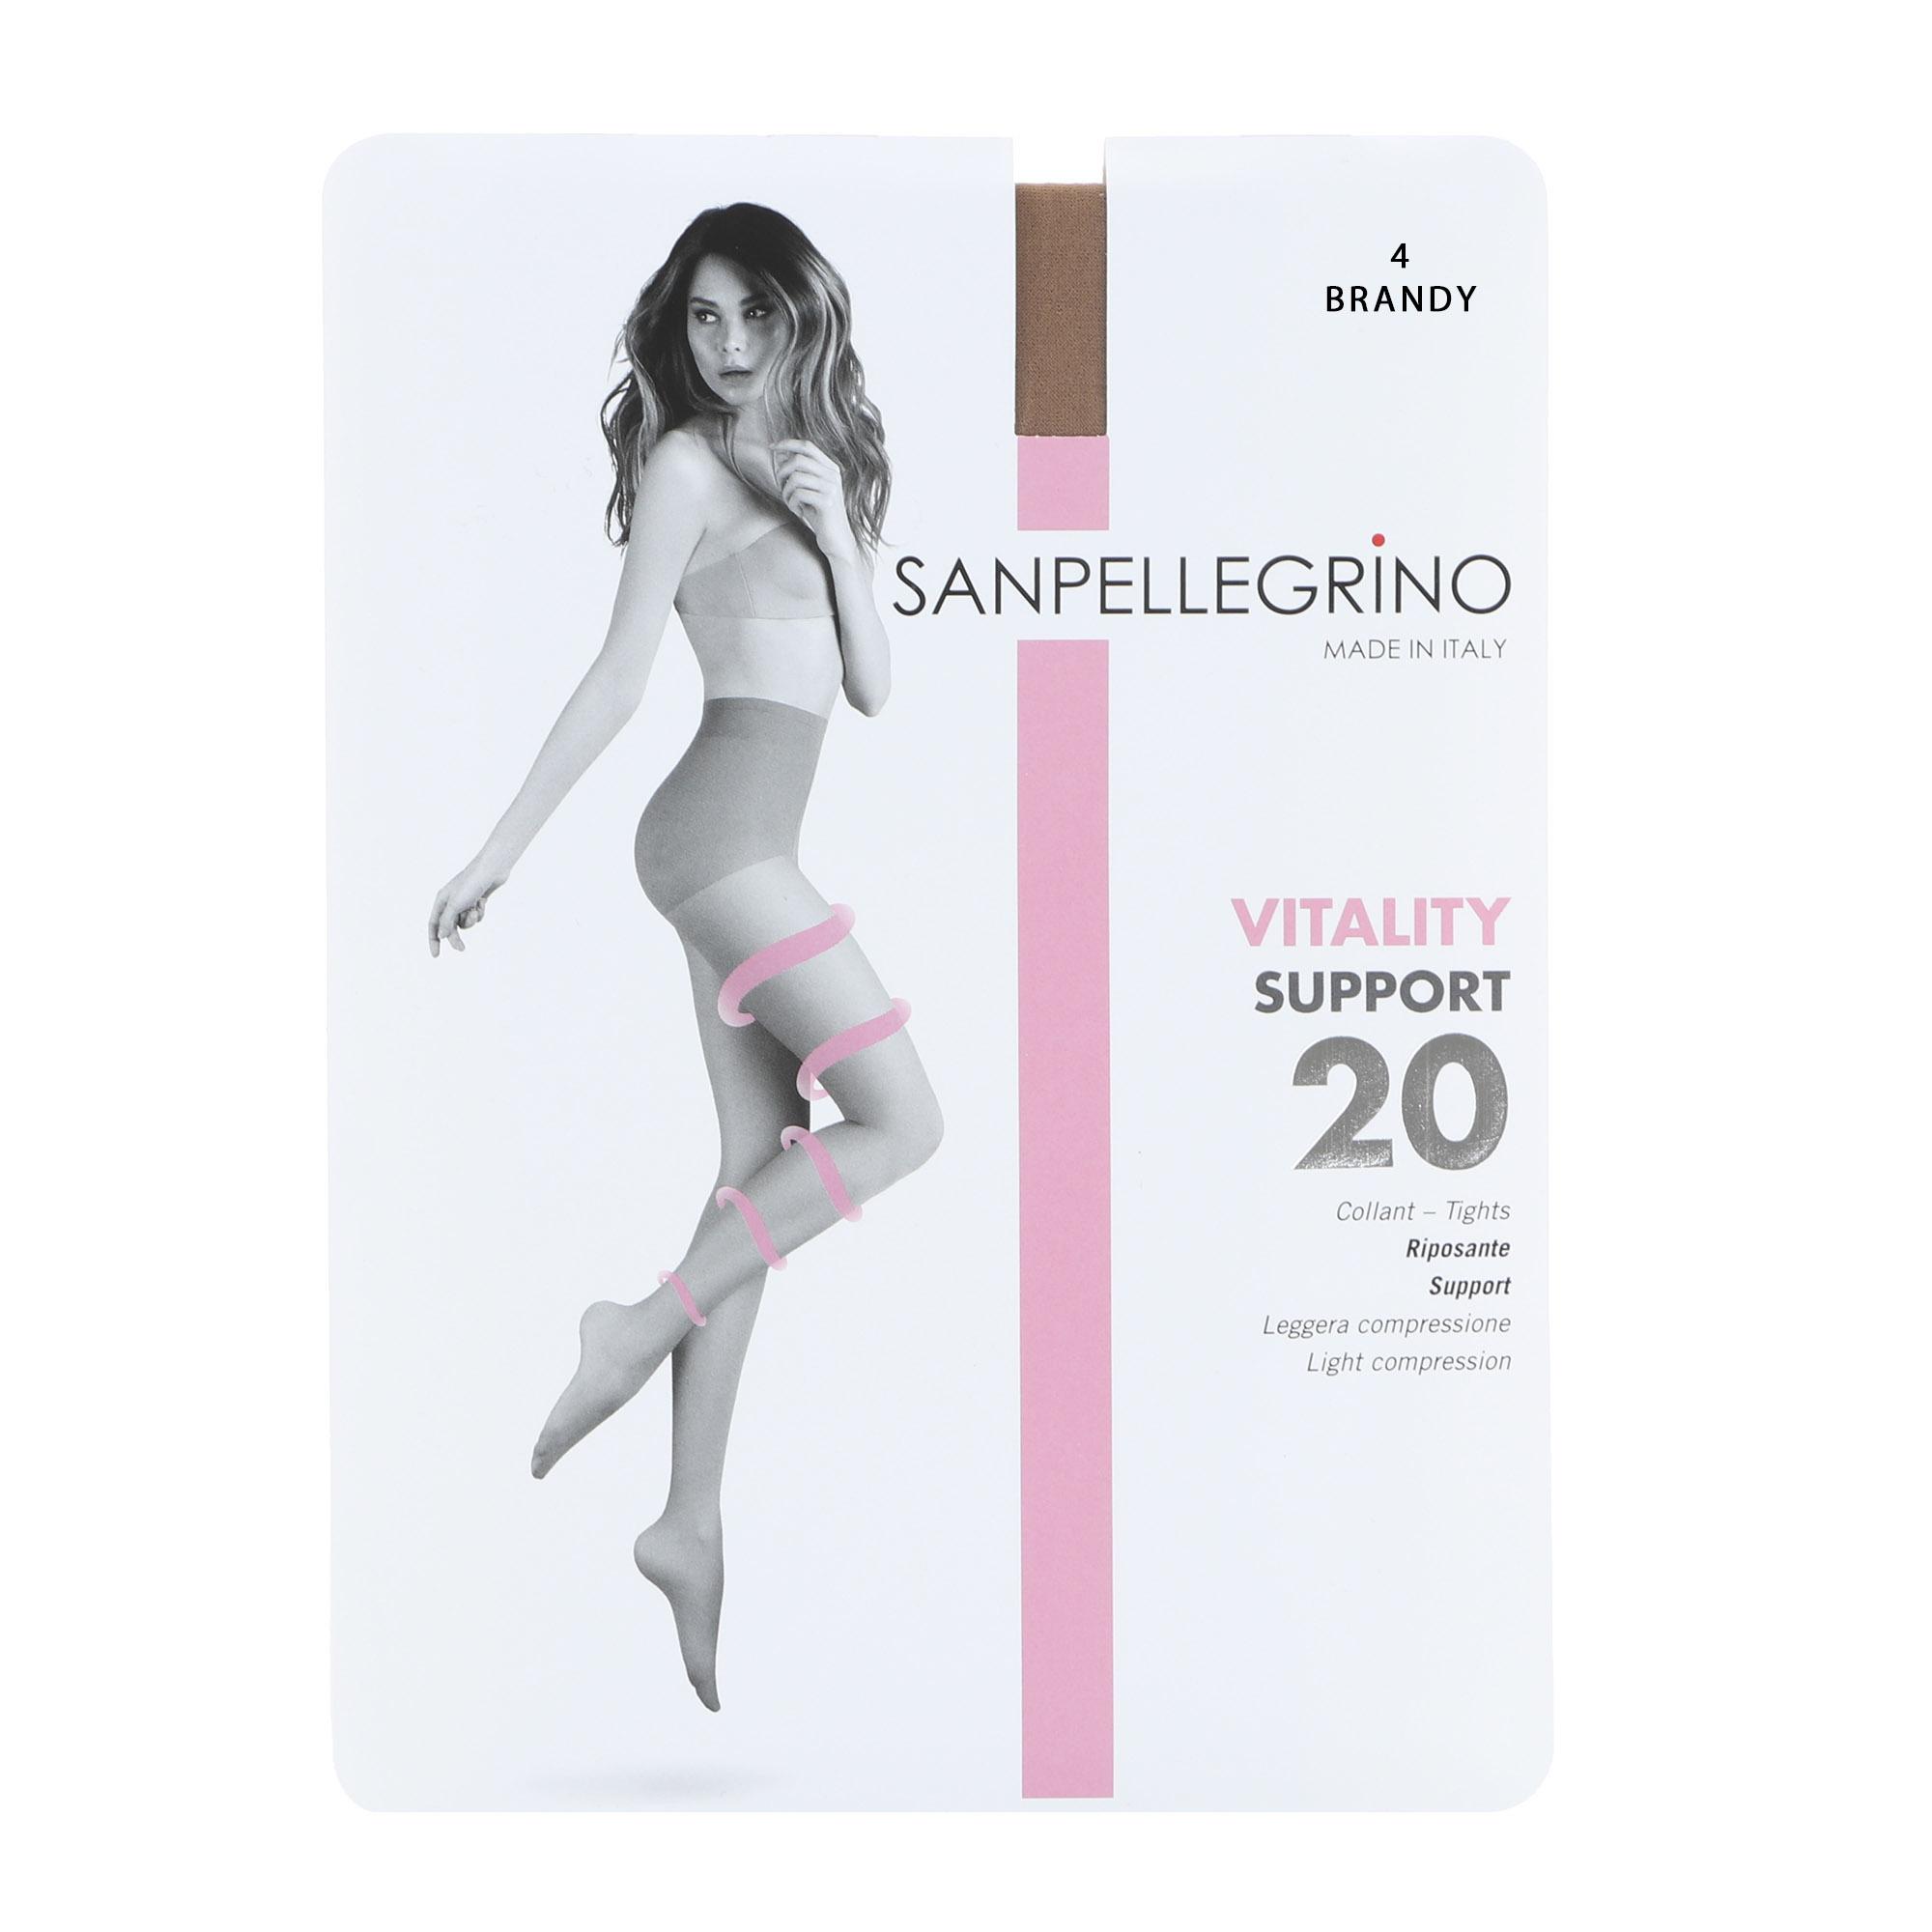 Колготки Sanpellegrino Support 20 Comfort Brandy XL недорого